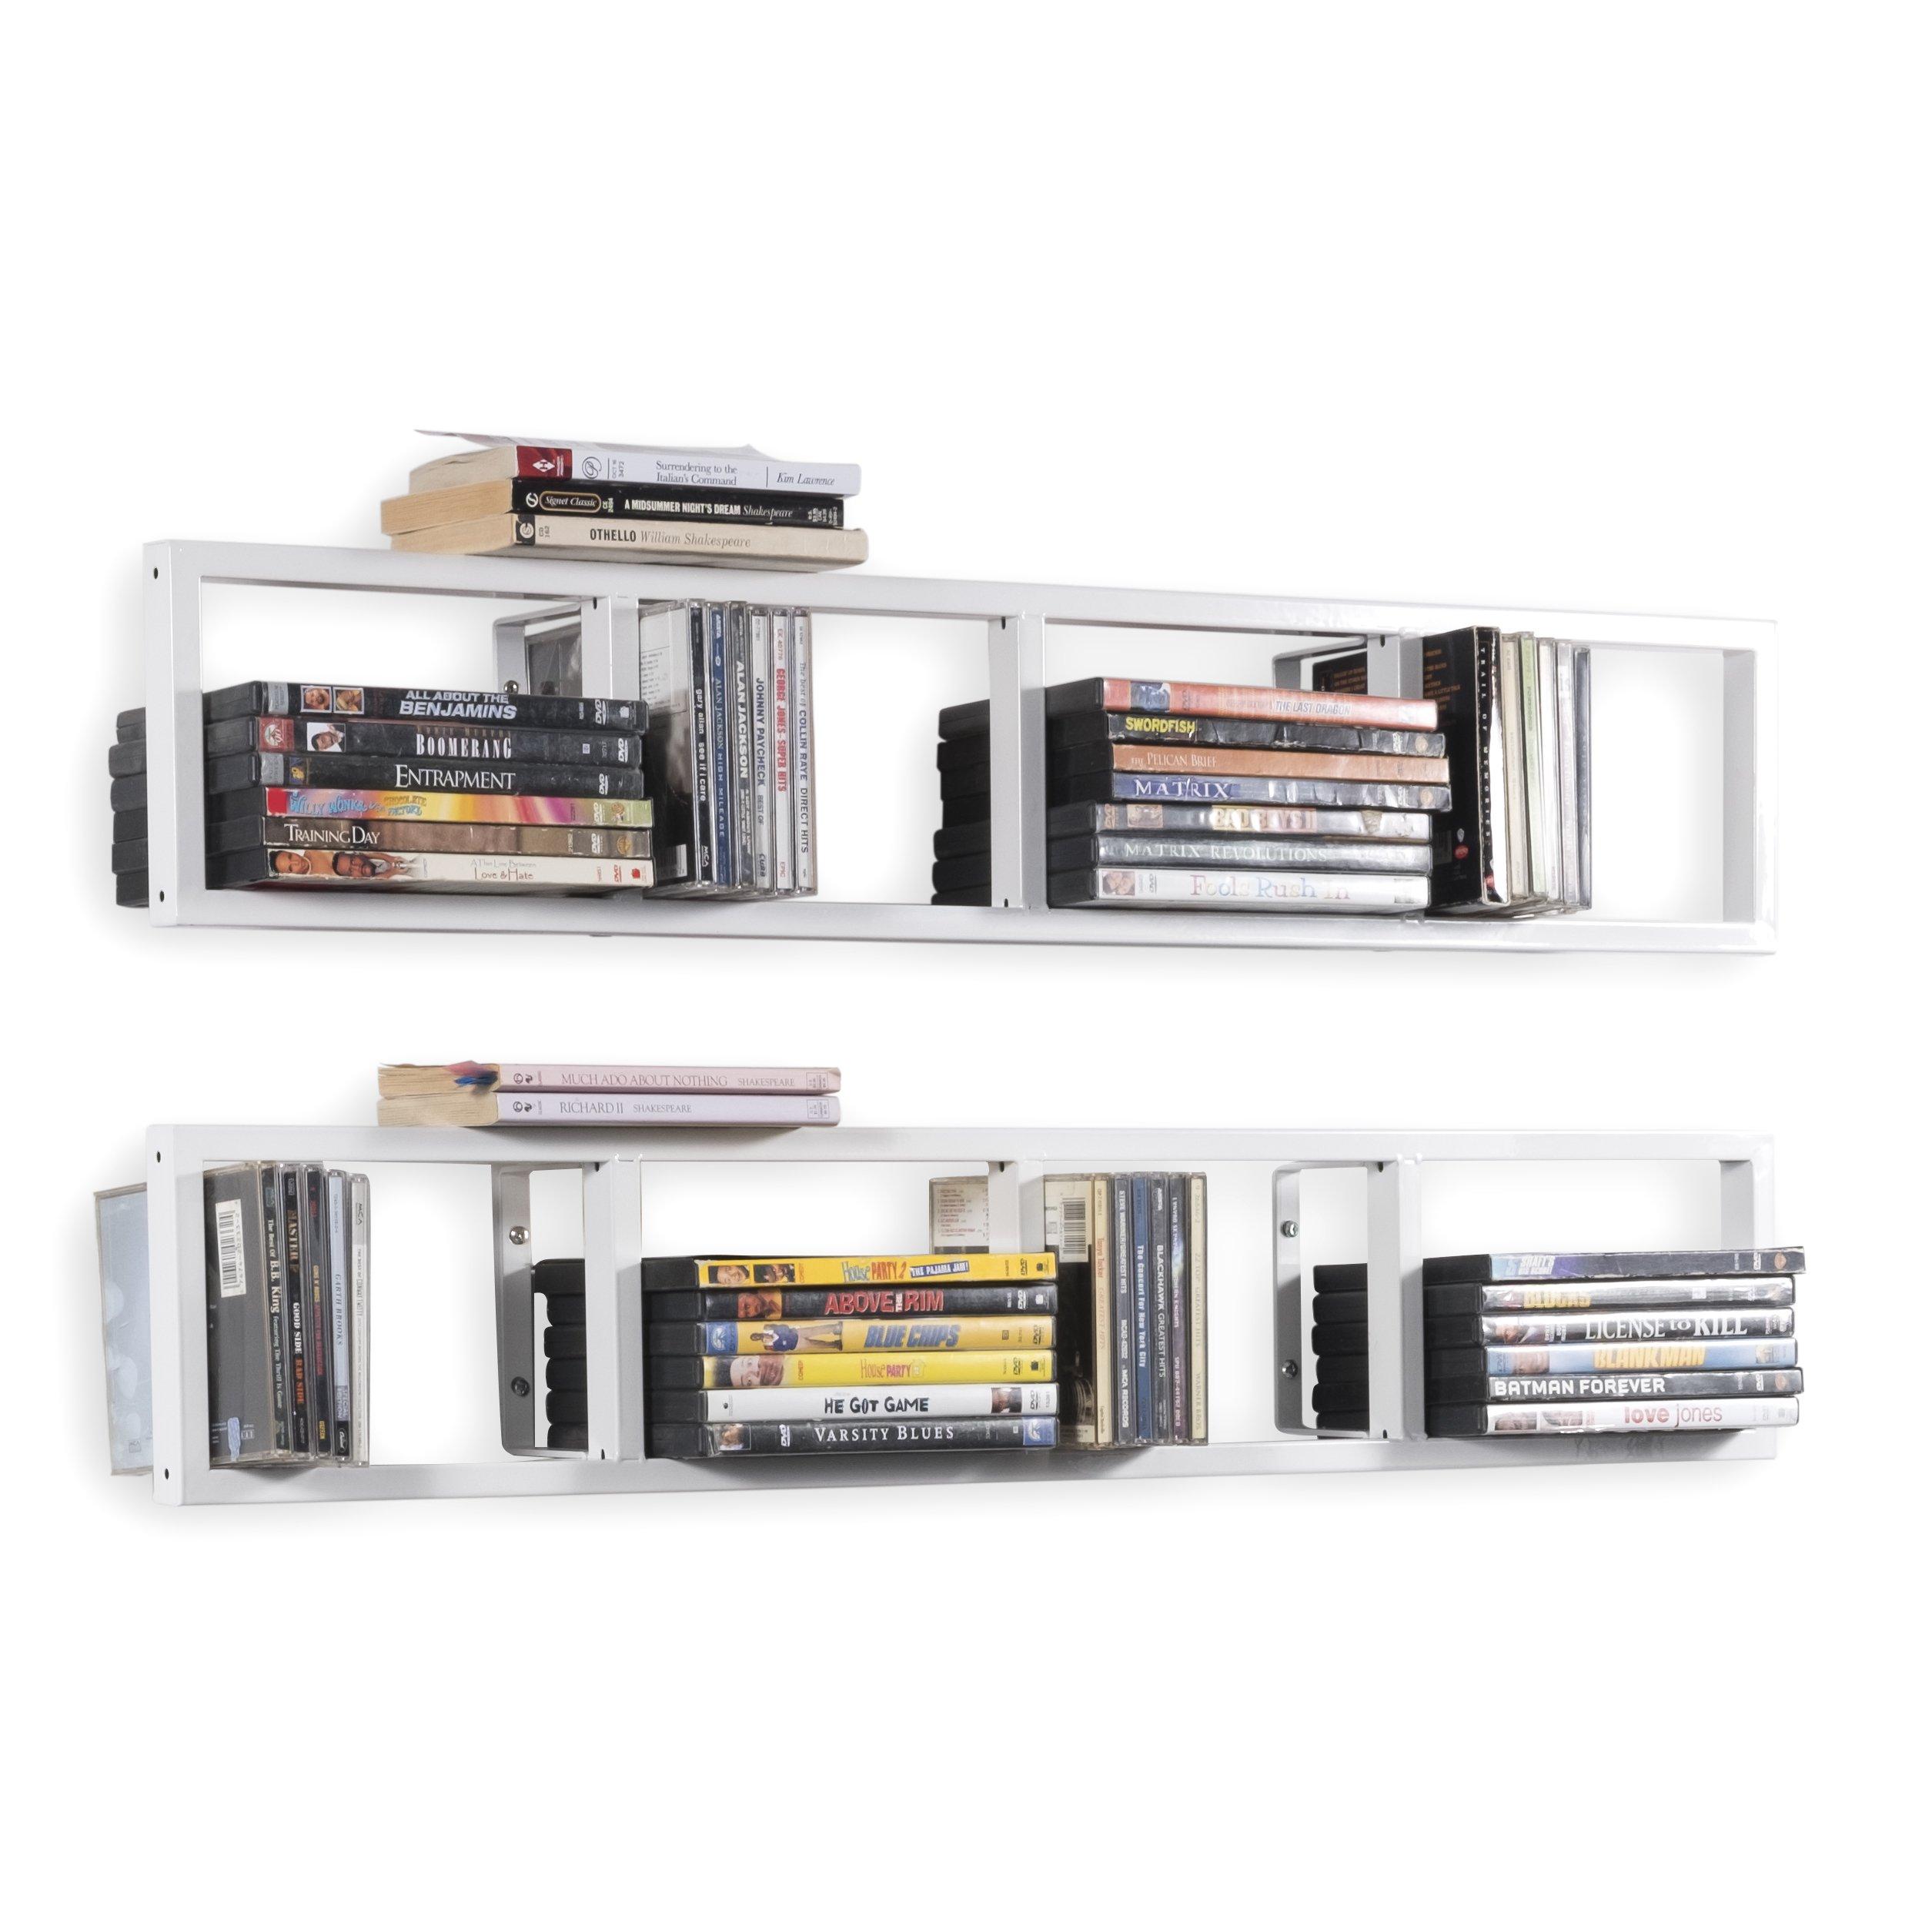 Wall Mount 34 Inch Media Storage Rack CD DVD Organizer Metal Floating Shelf Set of 2 White by BHG